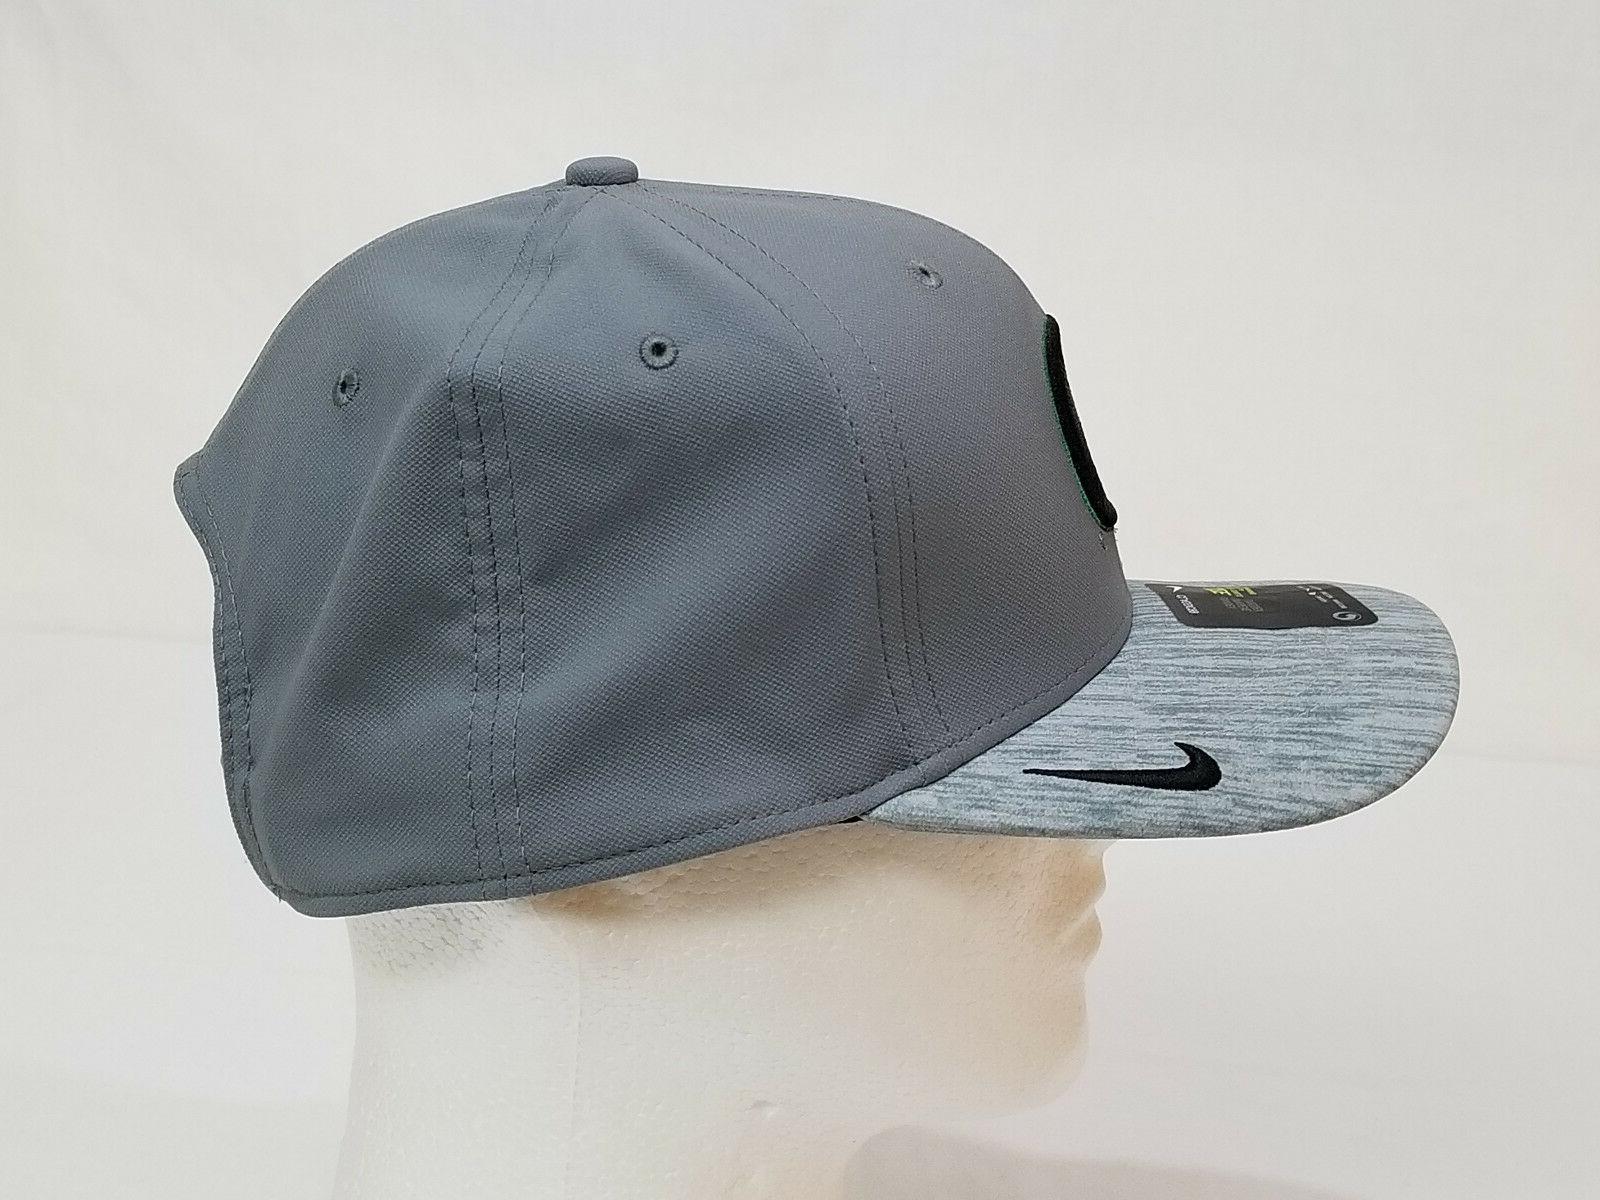 NEW DUCKS Football 2018 Dri-Fit Baseball CAP